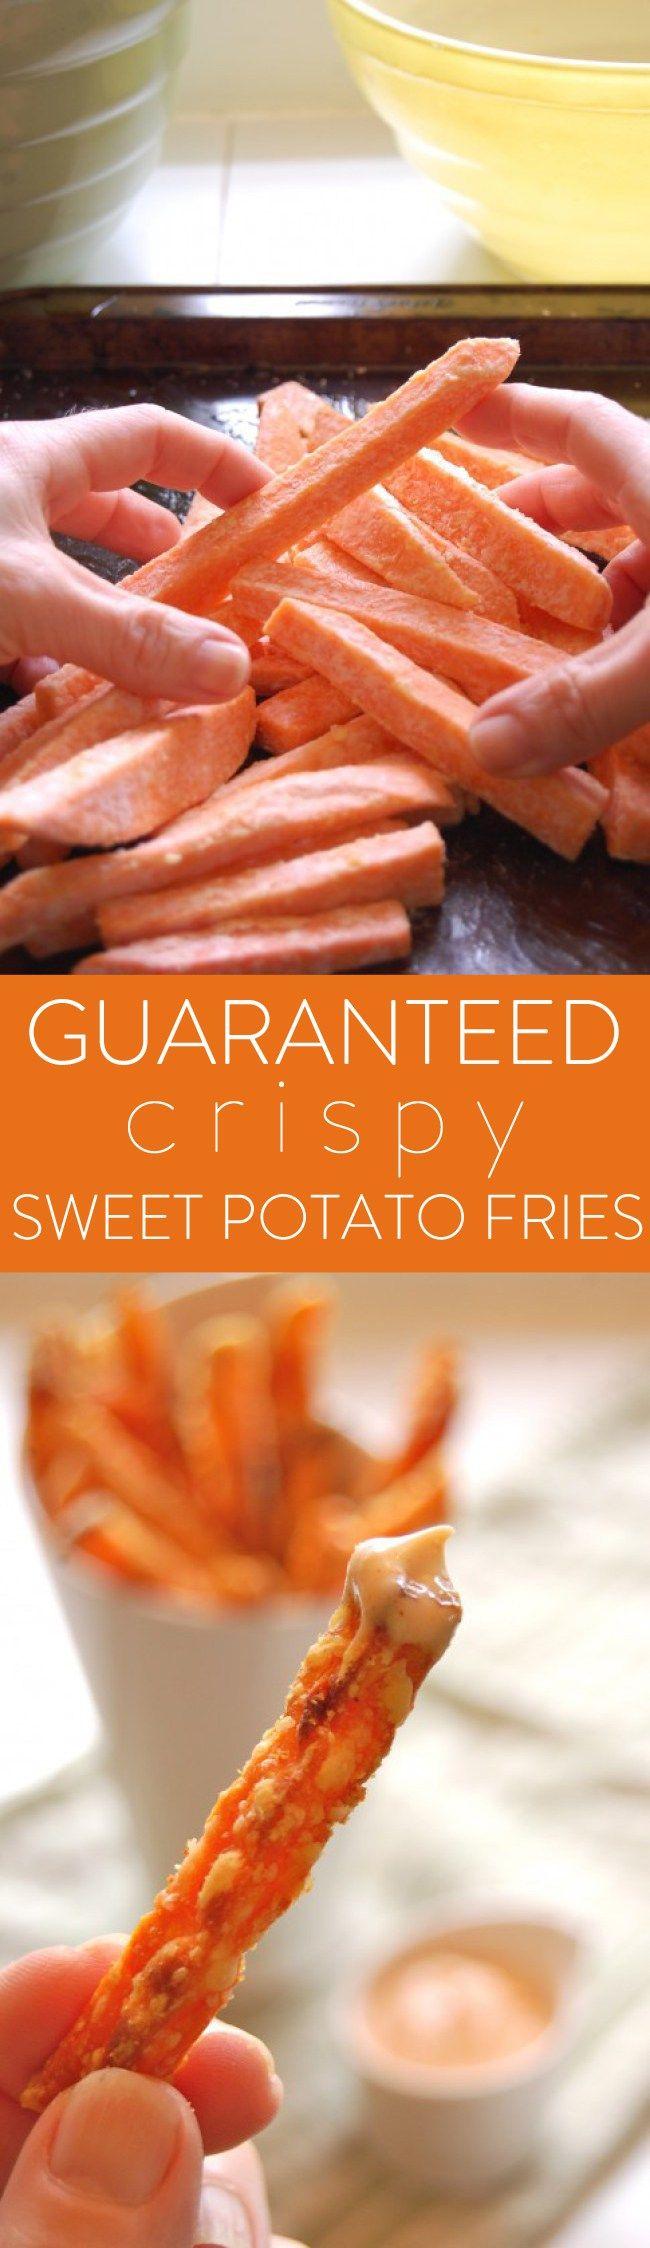 Guaranteed crispy sweet potato fries. No more mush in the mouth.